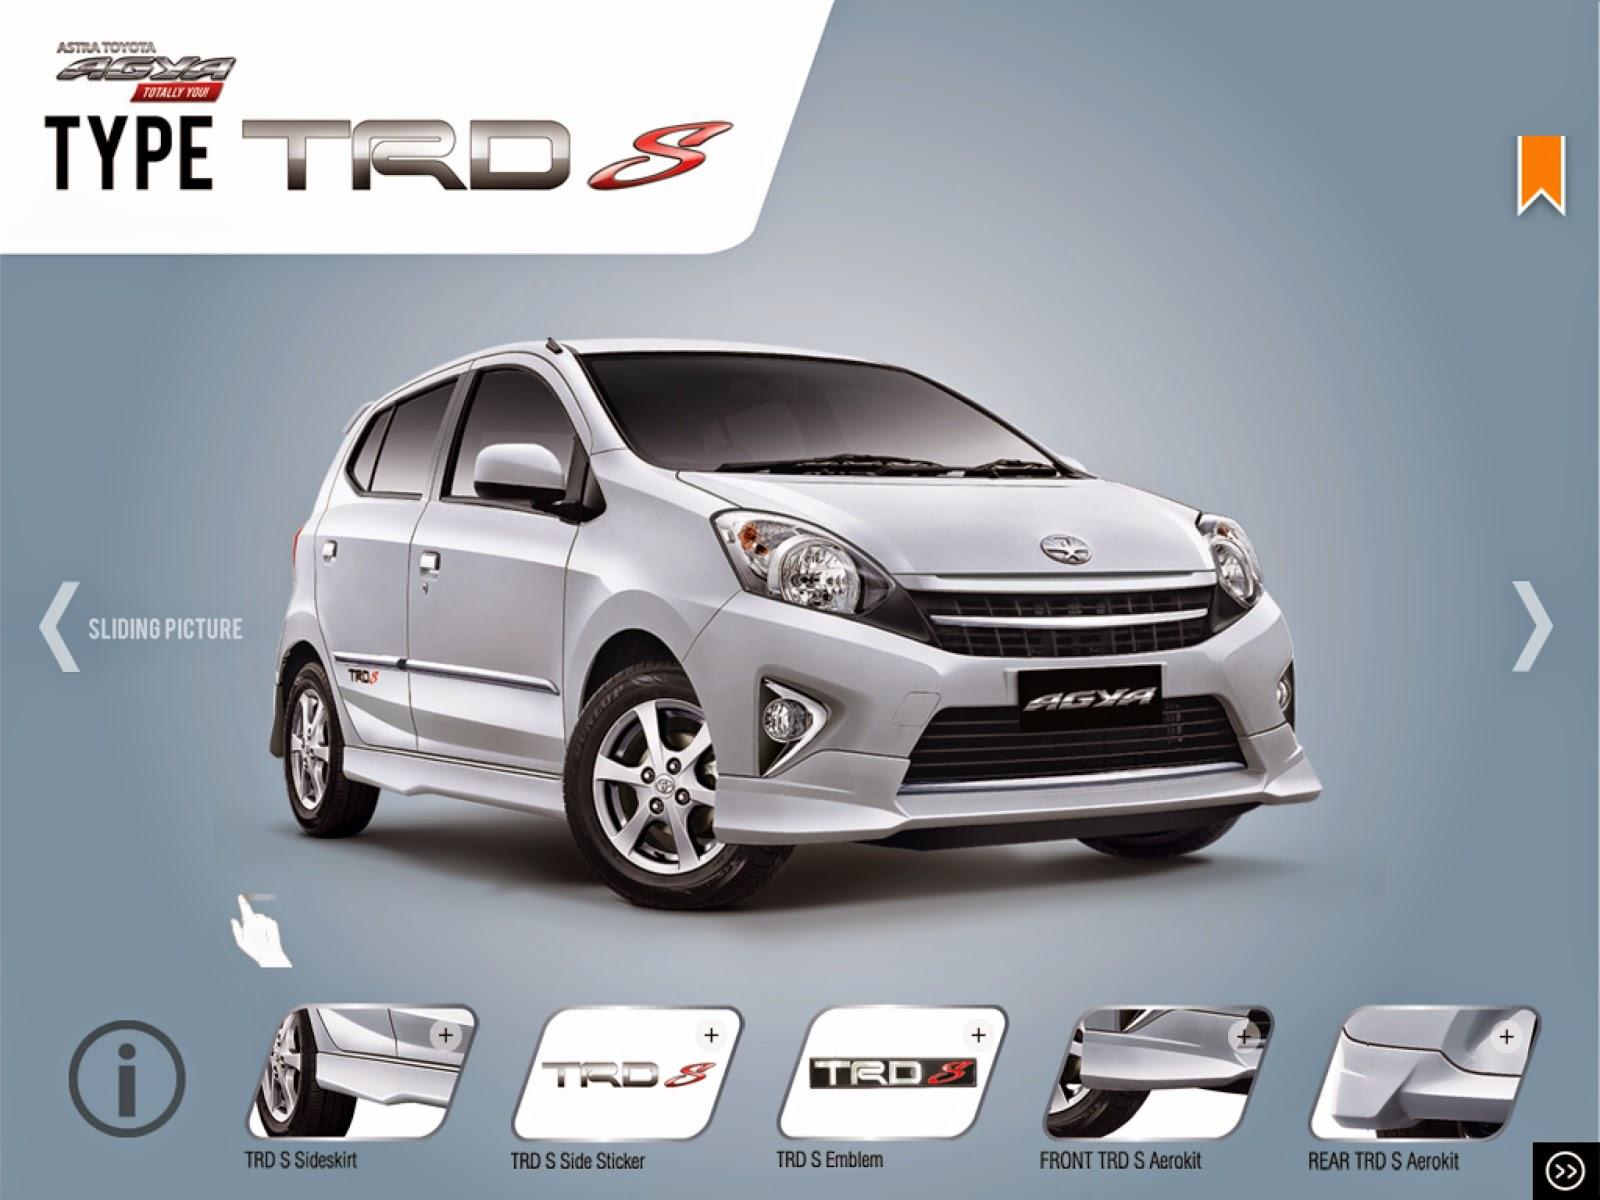 Spesifikasi New Agya Trd Perbedaan All Alphard X Dan G Pt Liek Motor Walikota Mustajab Surabaya Terkenal Murahnya